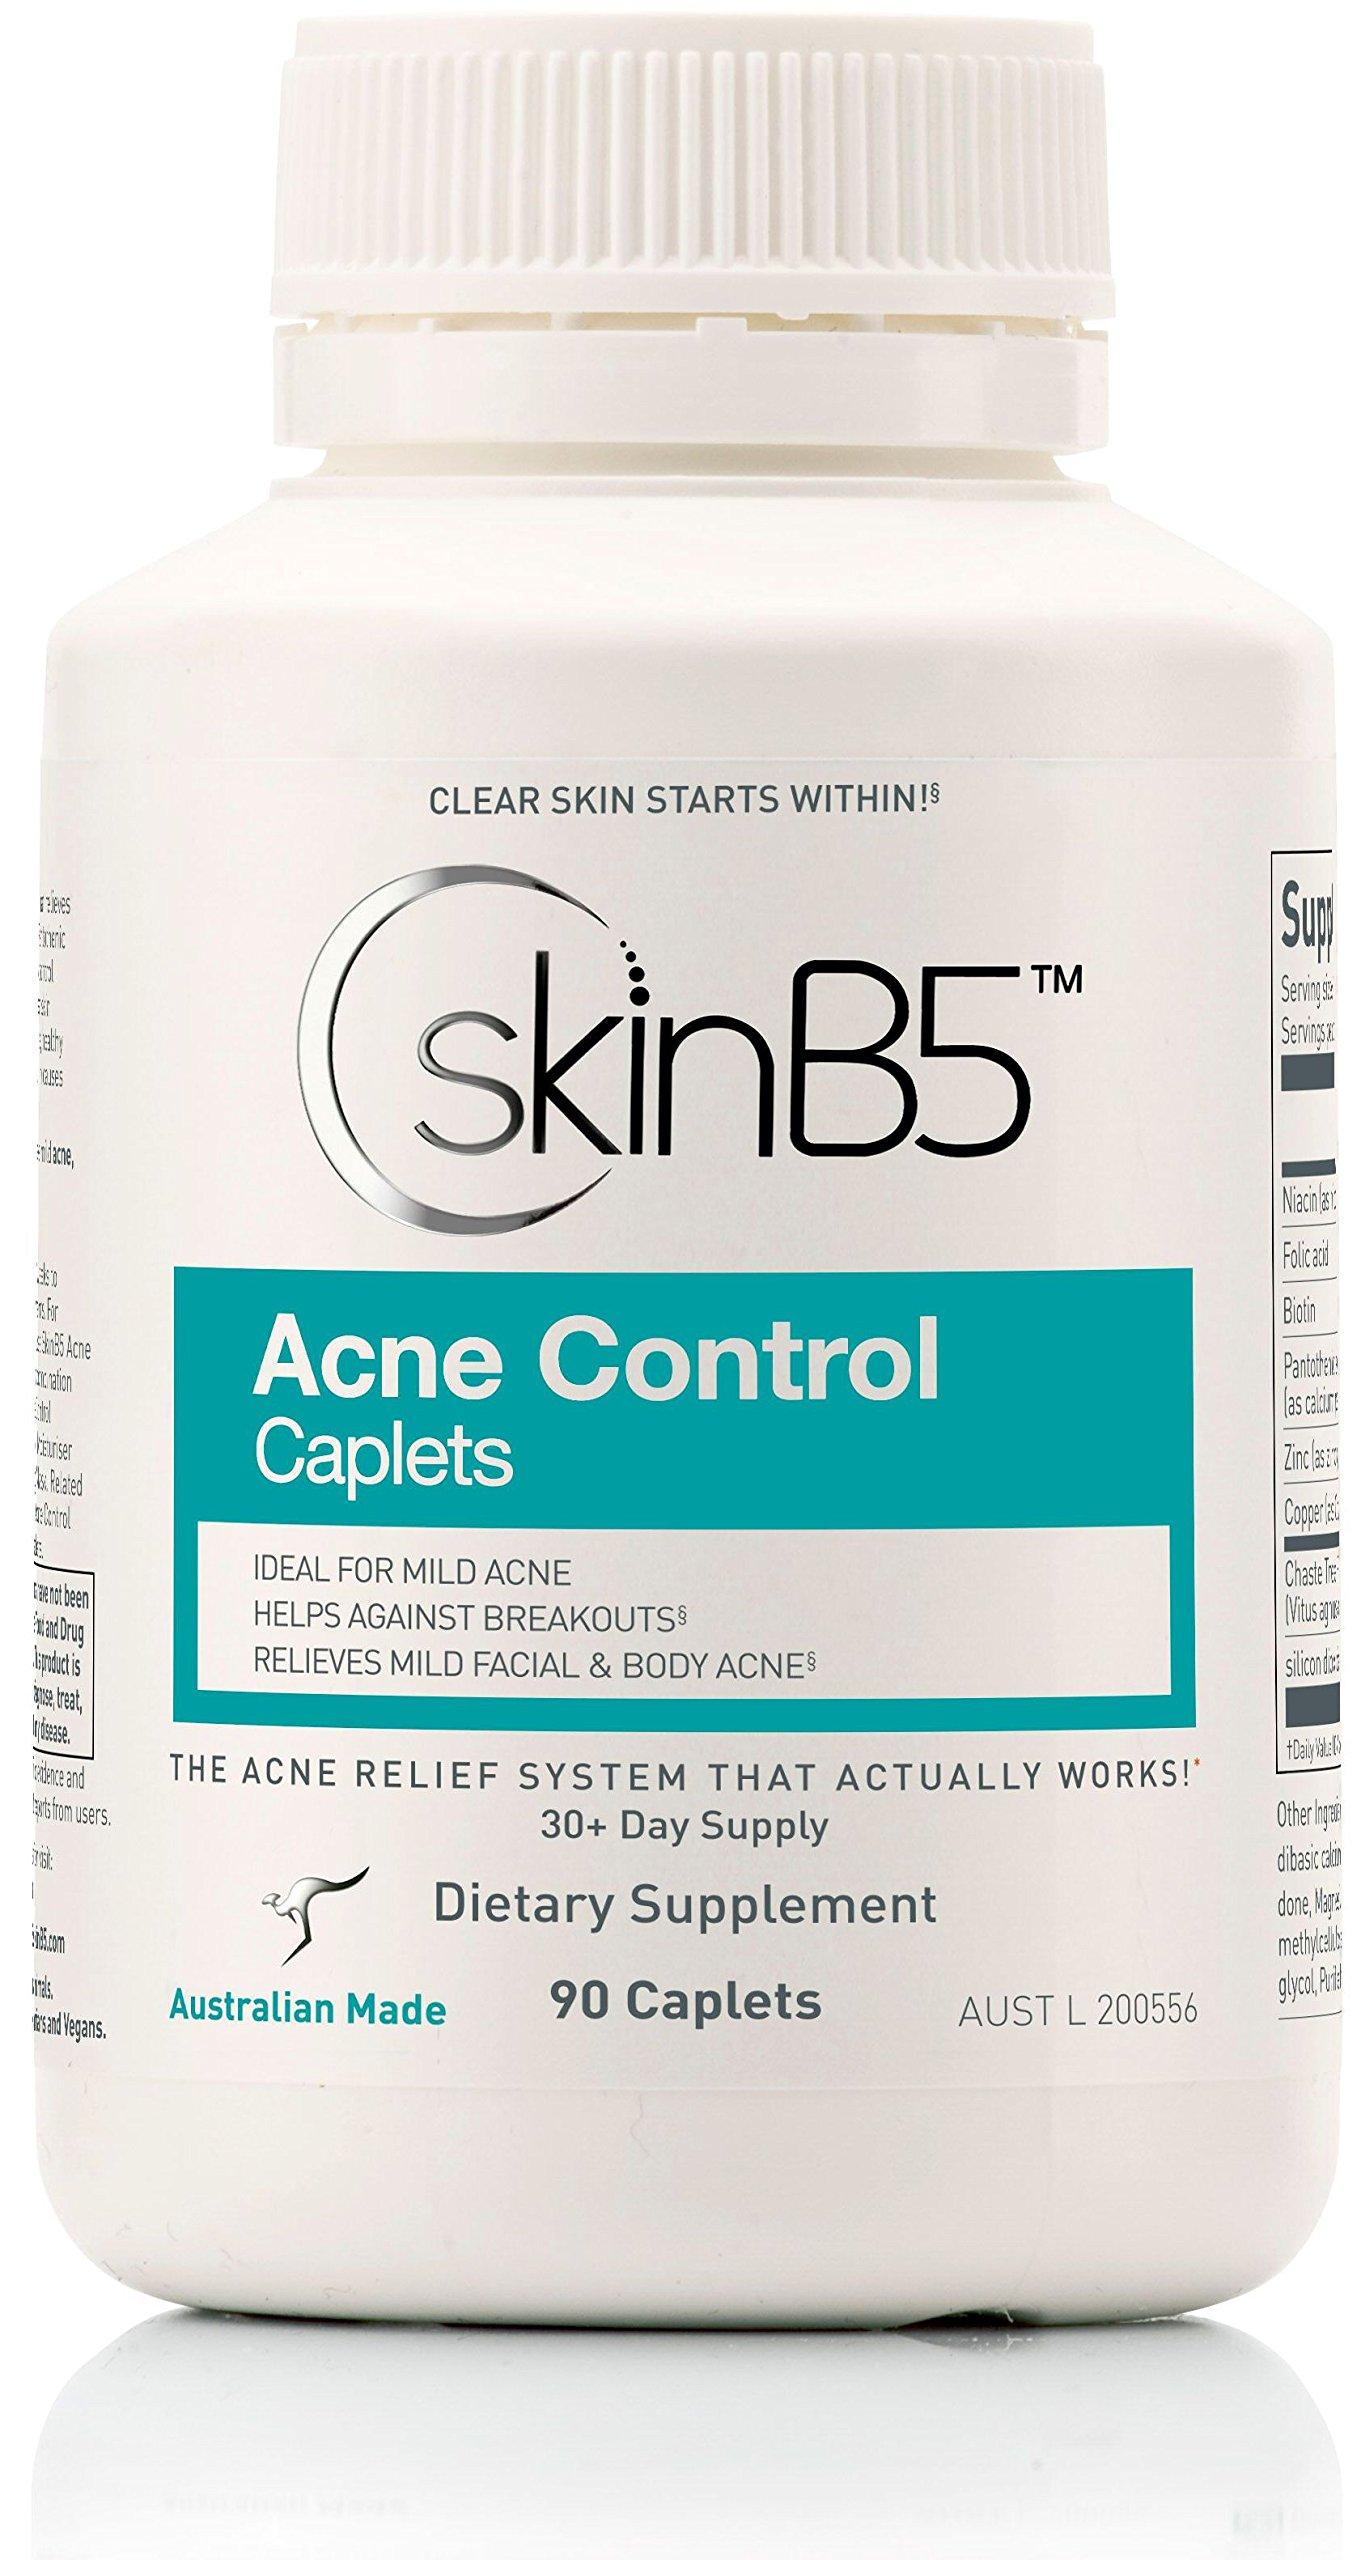 SkinB5 Acne Control Skin Care Treatment, Caplets, 90 caplets